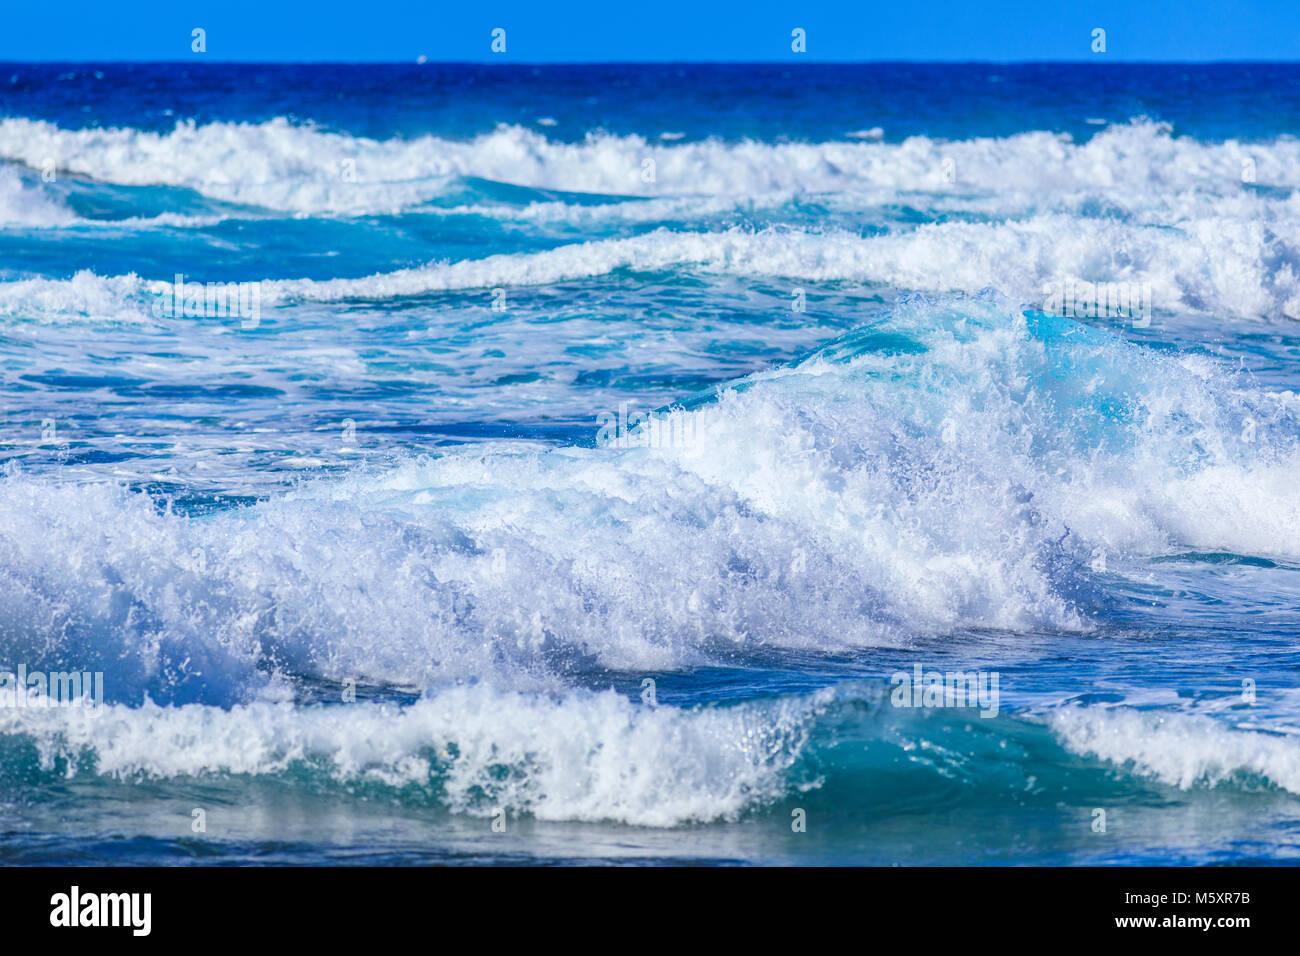 ocean waves background stock photo 175765951 alamy